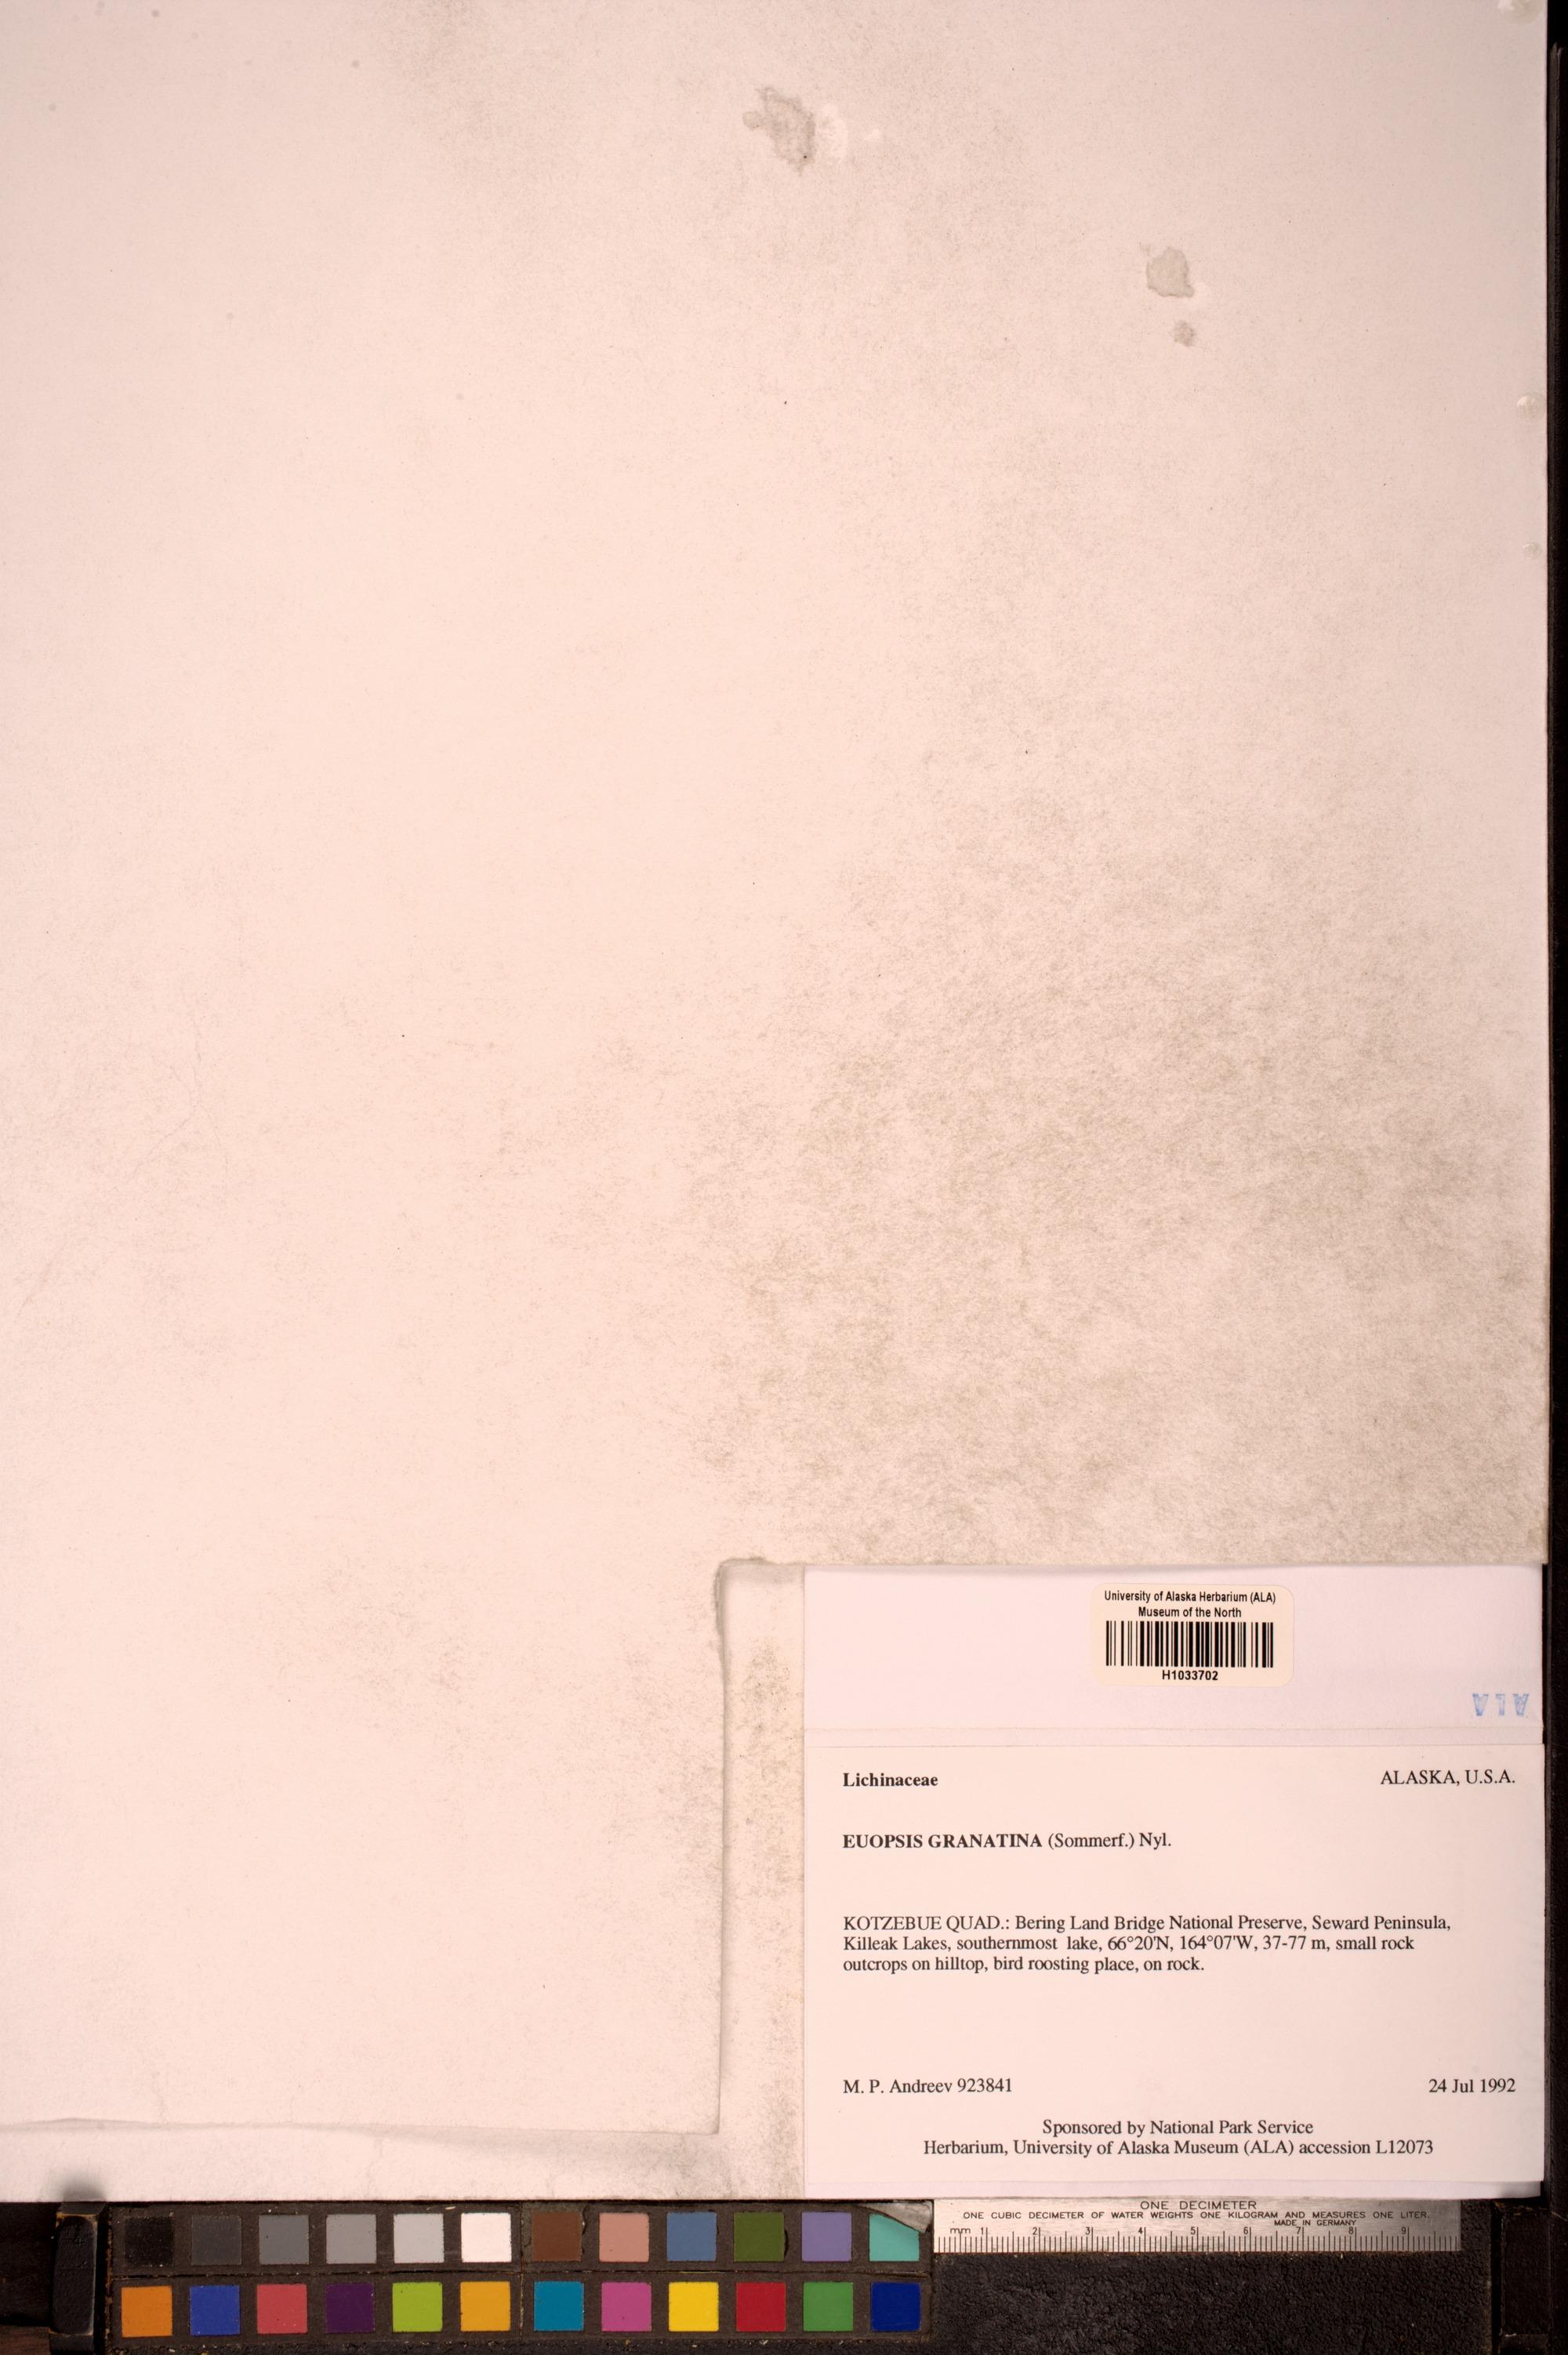 Euopsis granatina image